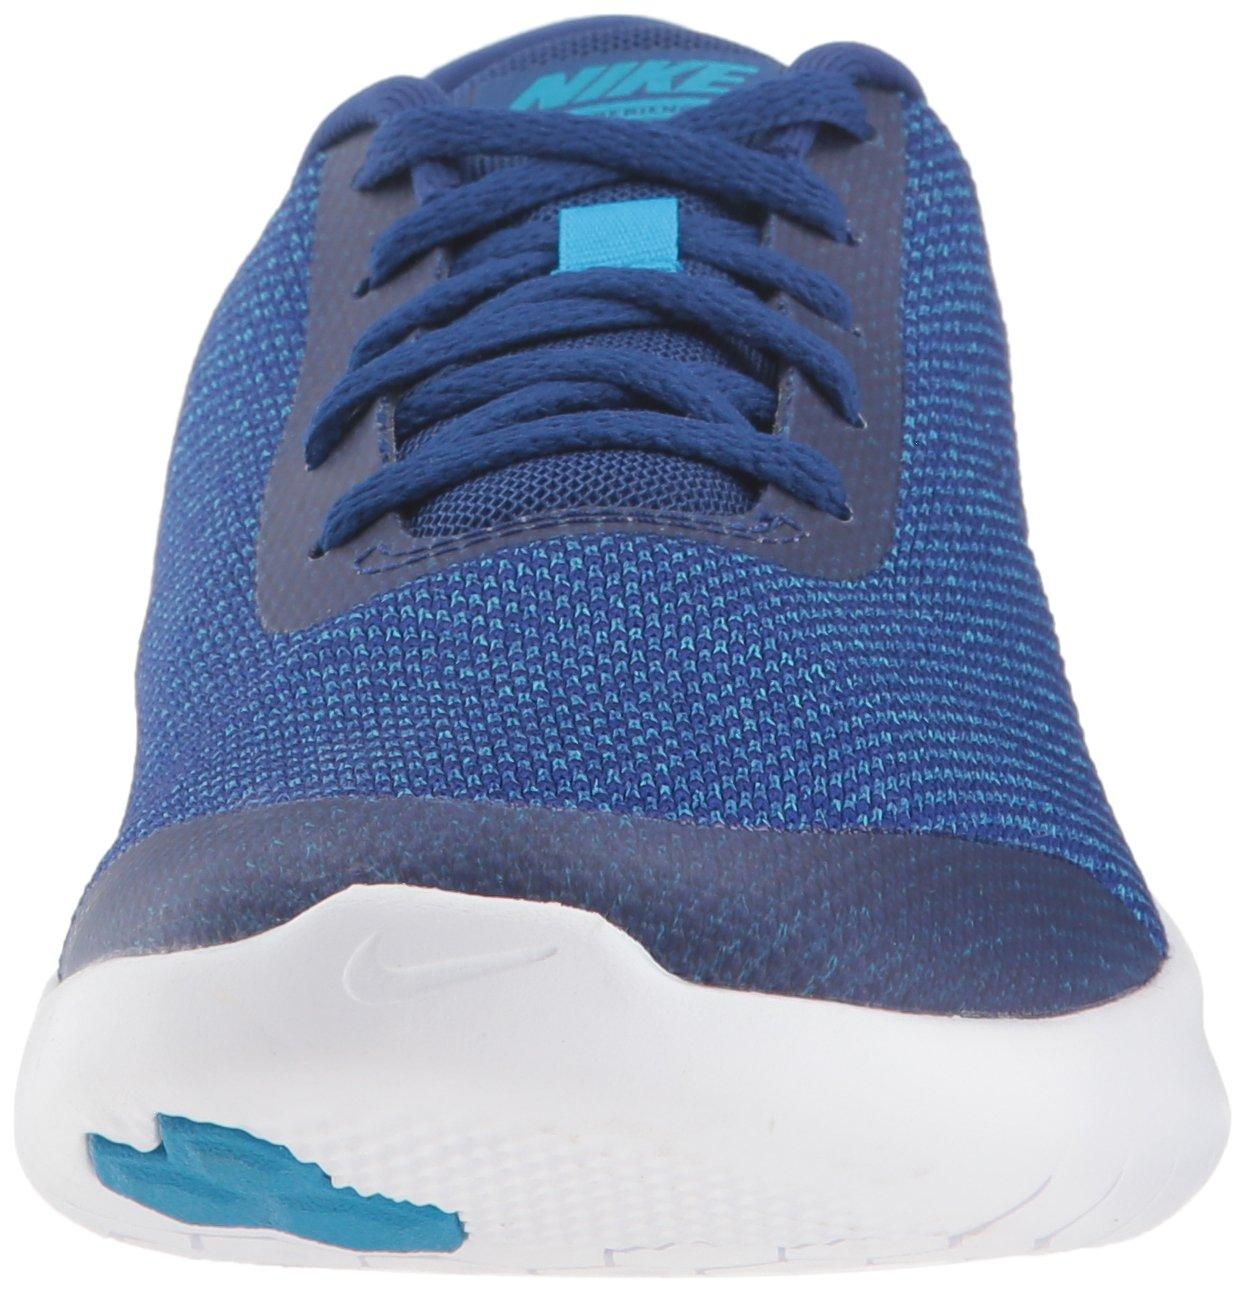 NIKE Men's Flex Experience 7 Running Shoe B078PNPWK6 14 M US|Deep Royal Blue/Blue Hero-white